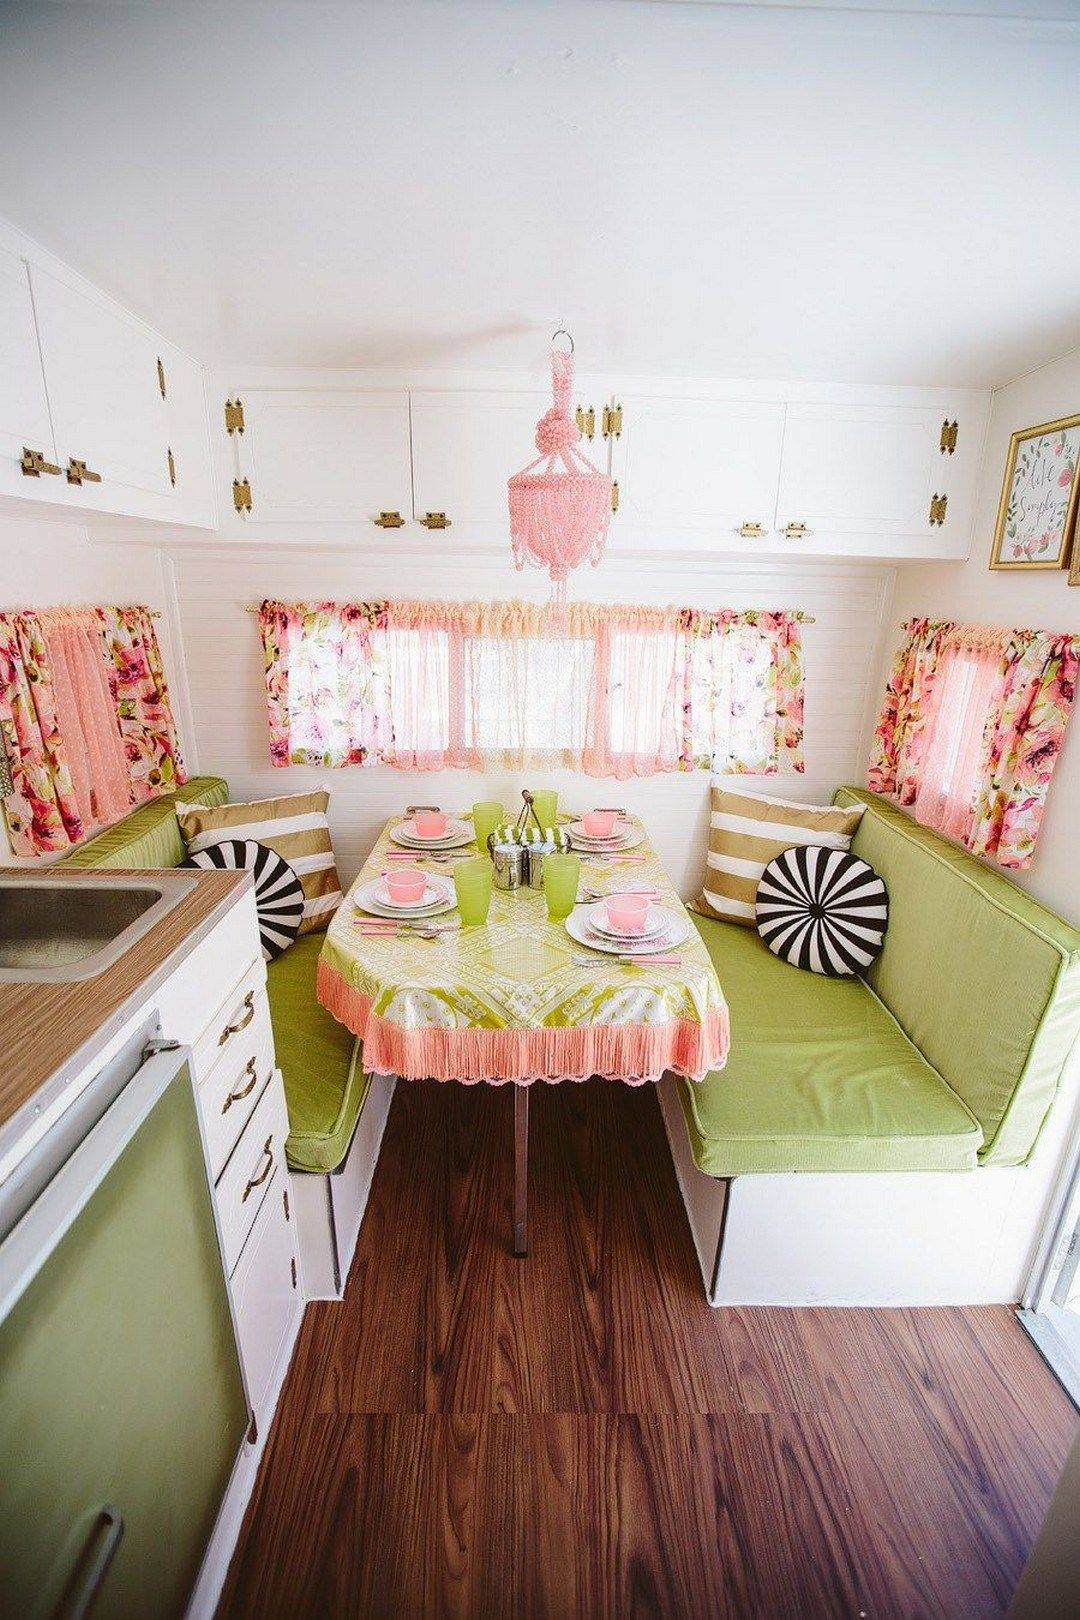 Small camper interior  vintage camper decor transformed into a cozy place  in